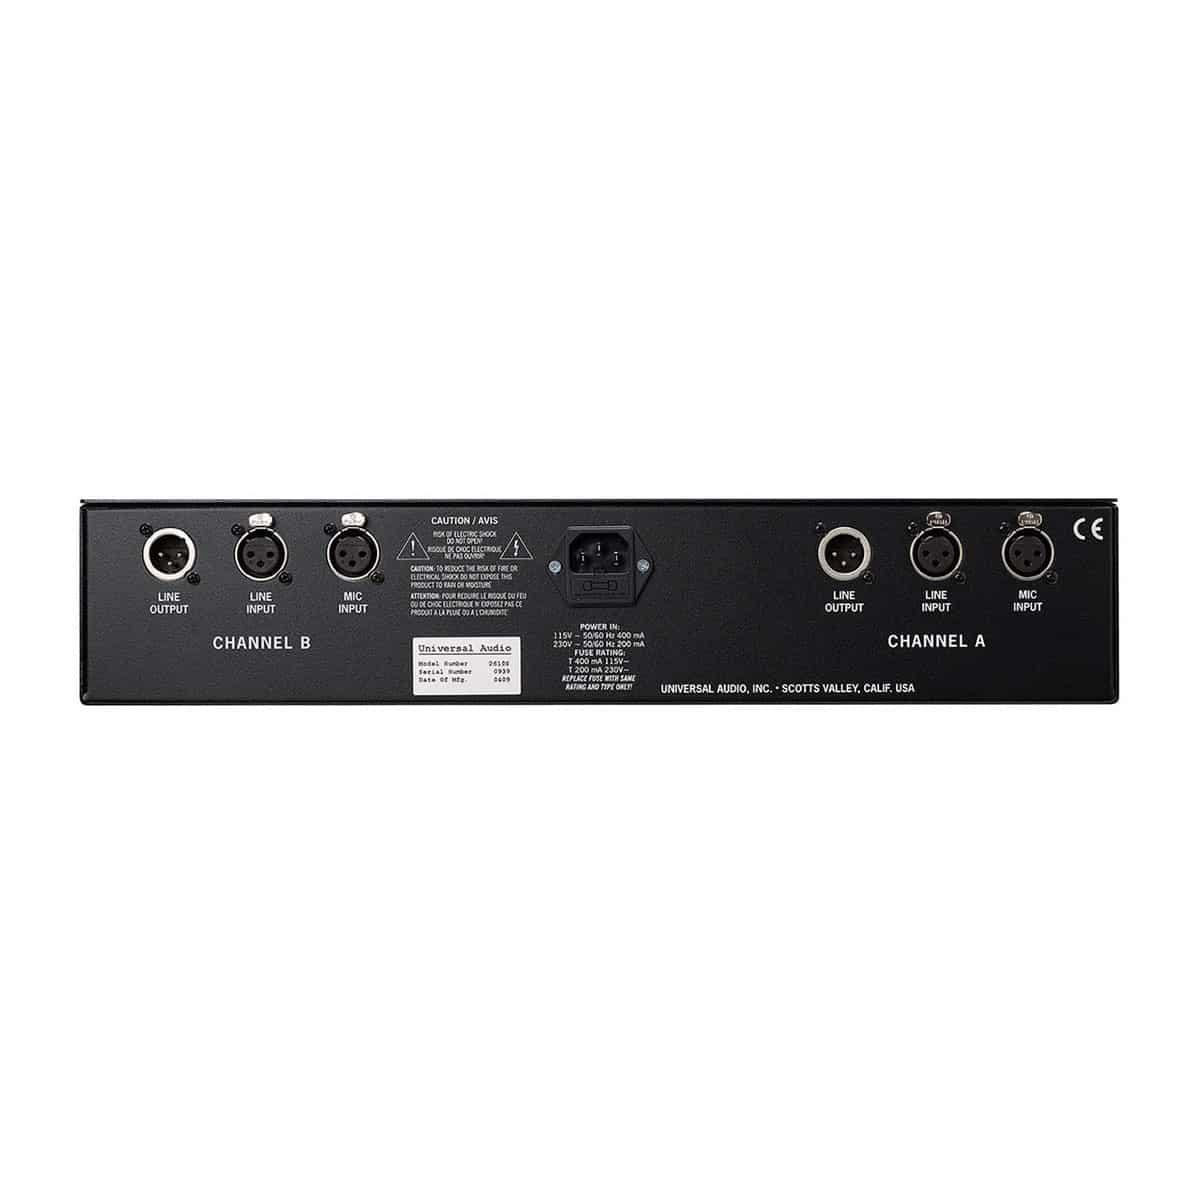 Universal Audio 2 610 02 Universal Audio 2 610